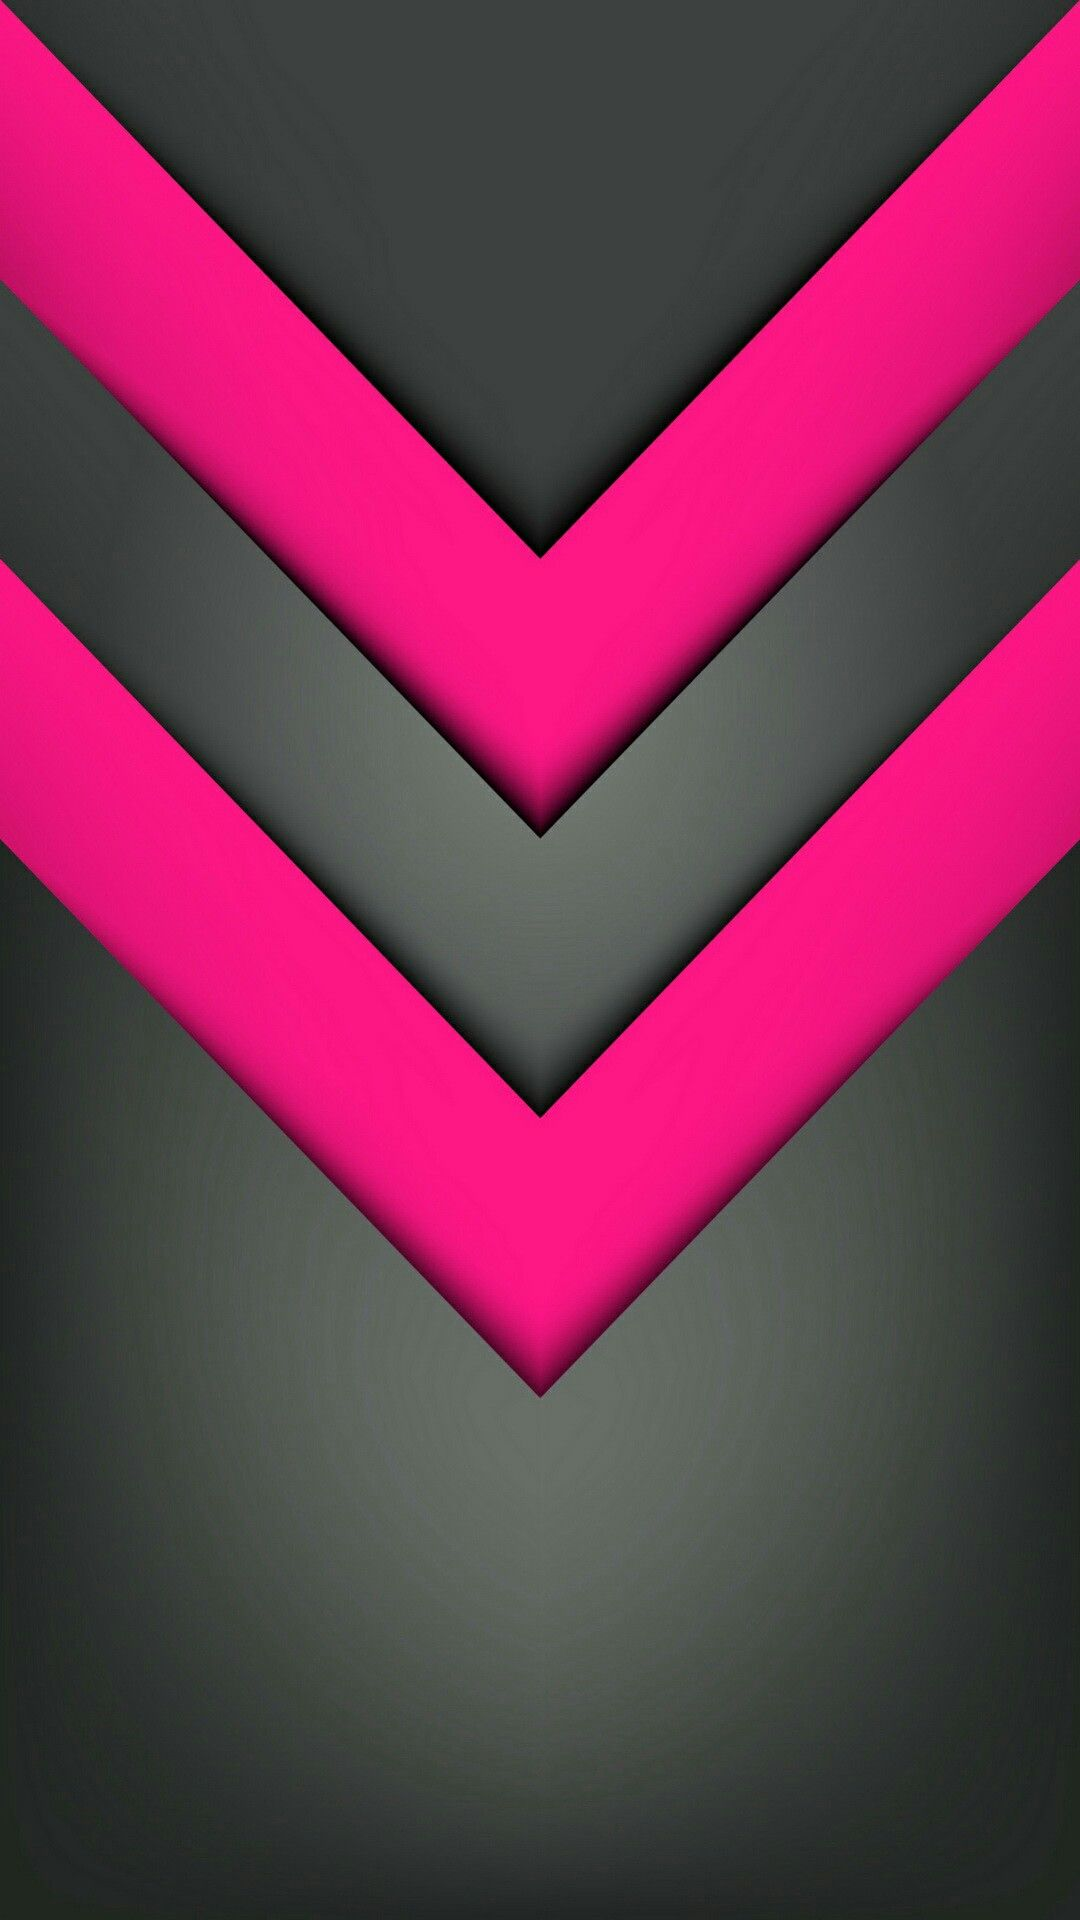 Pink And Grey Abstract Wallpaper Pink And Black Wallpaper Grey